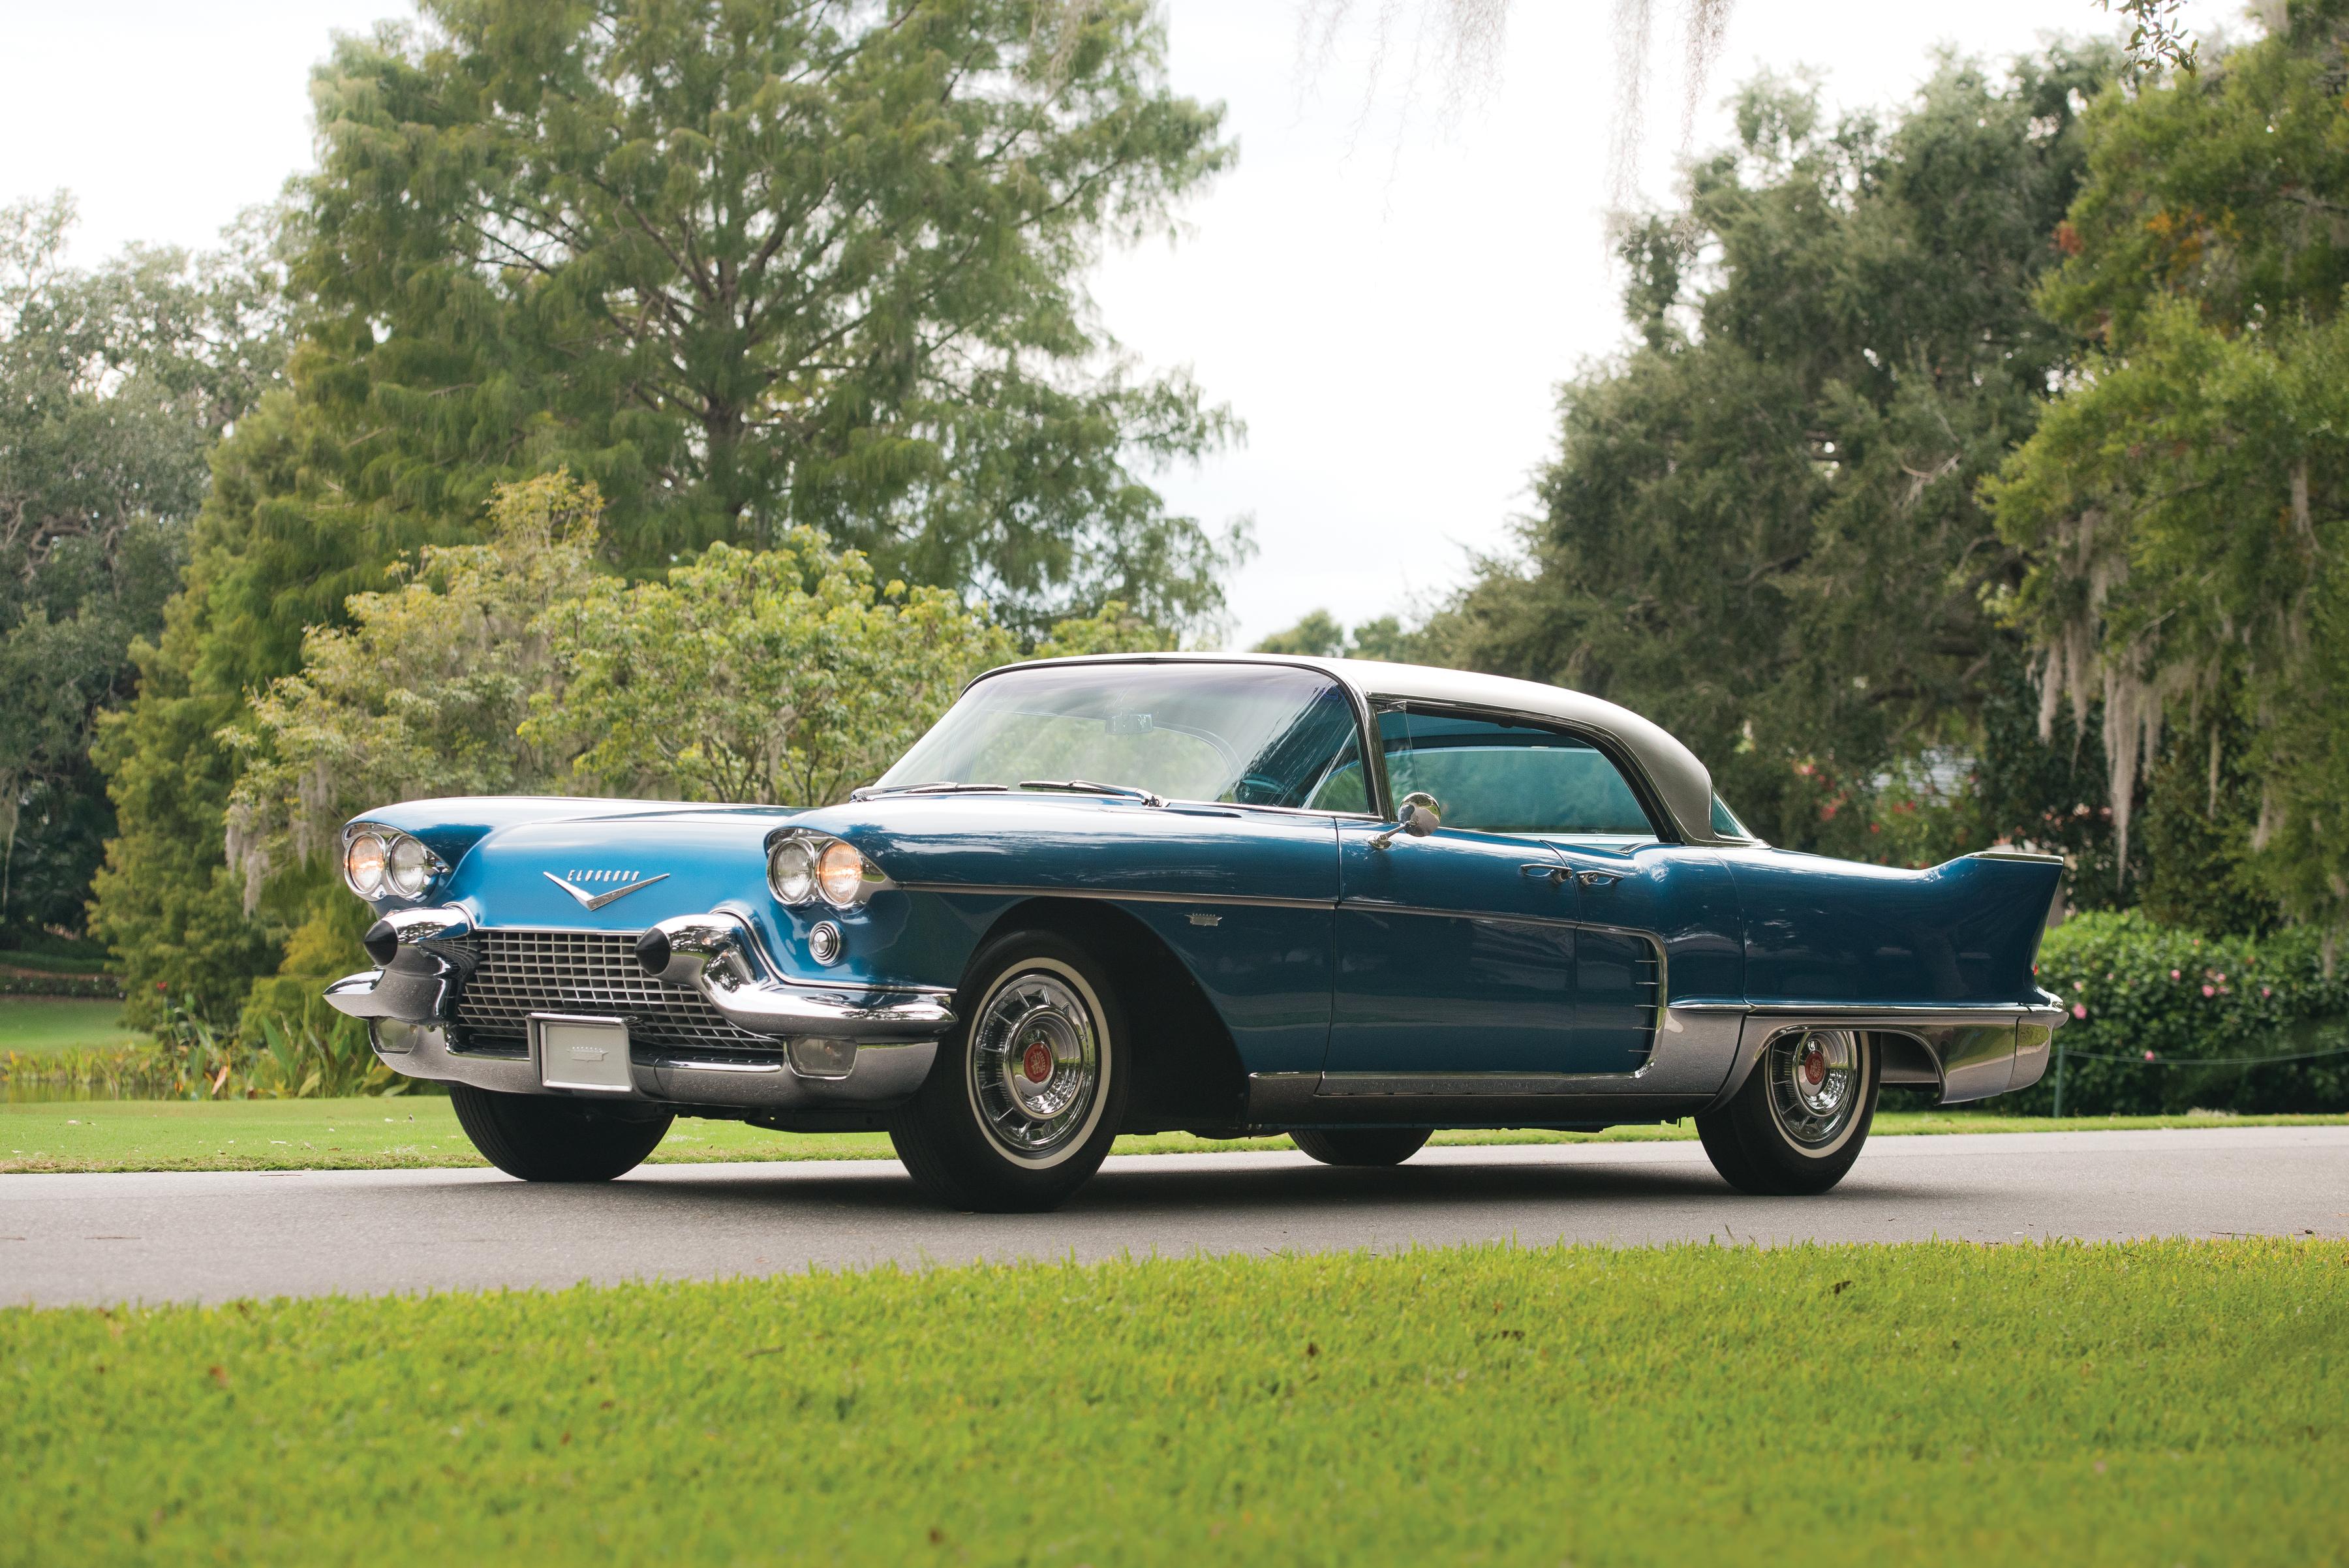 Amazing 1958 Cadillac Eldorado Brougham Pictures & Backgrounds